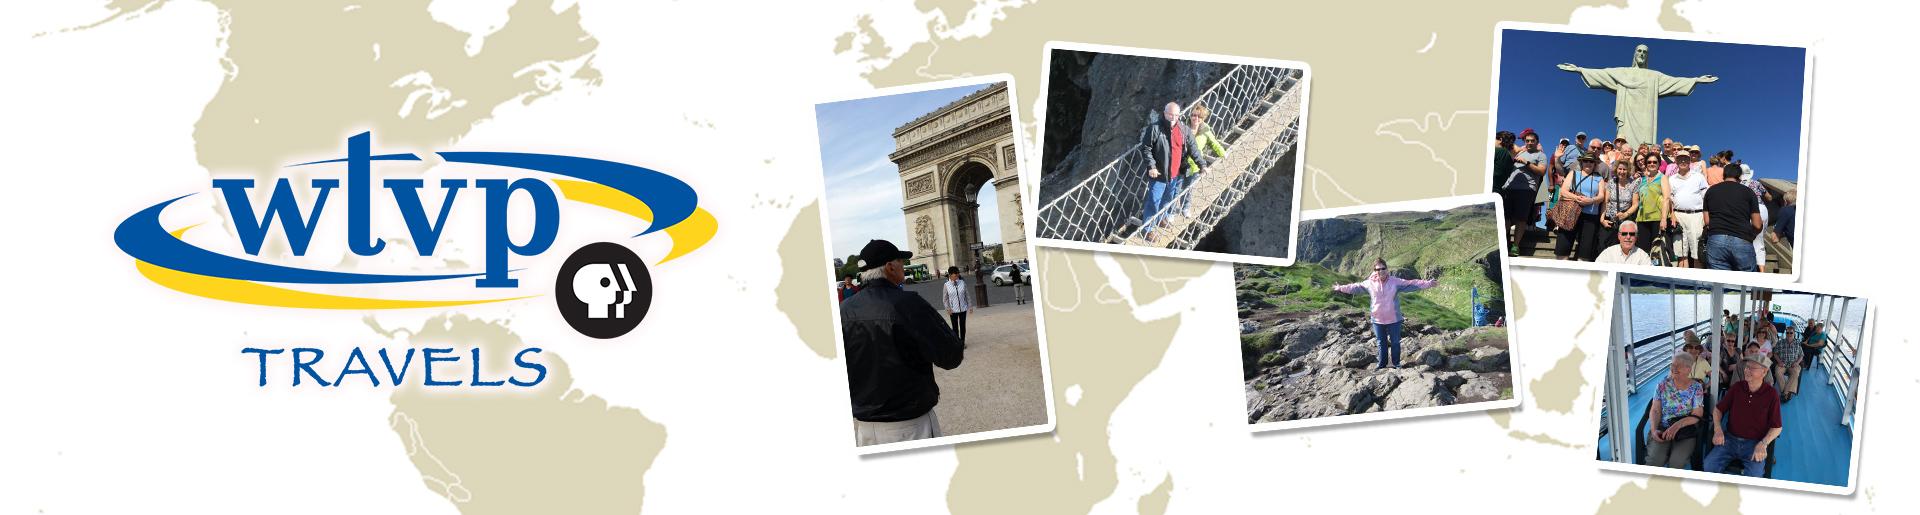 WTVP Travels Header